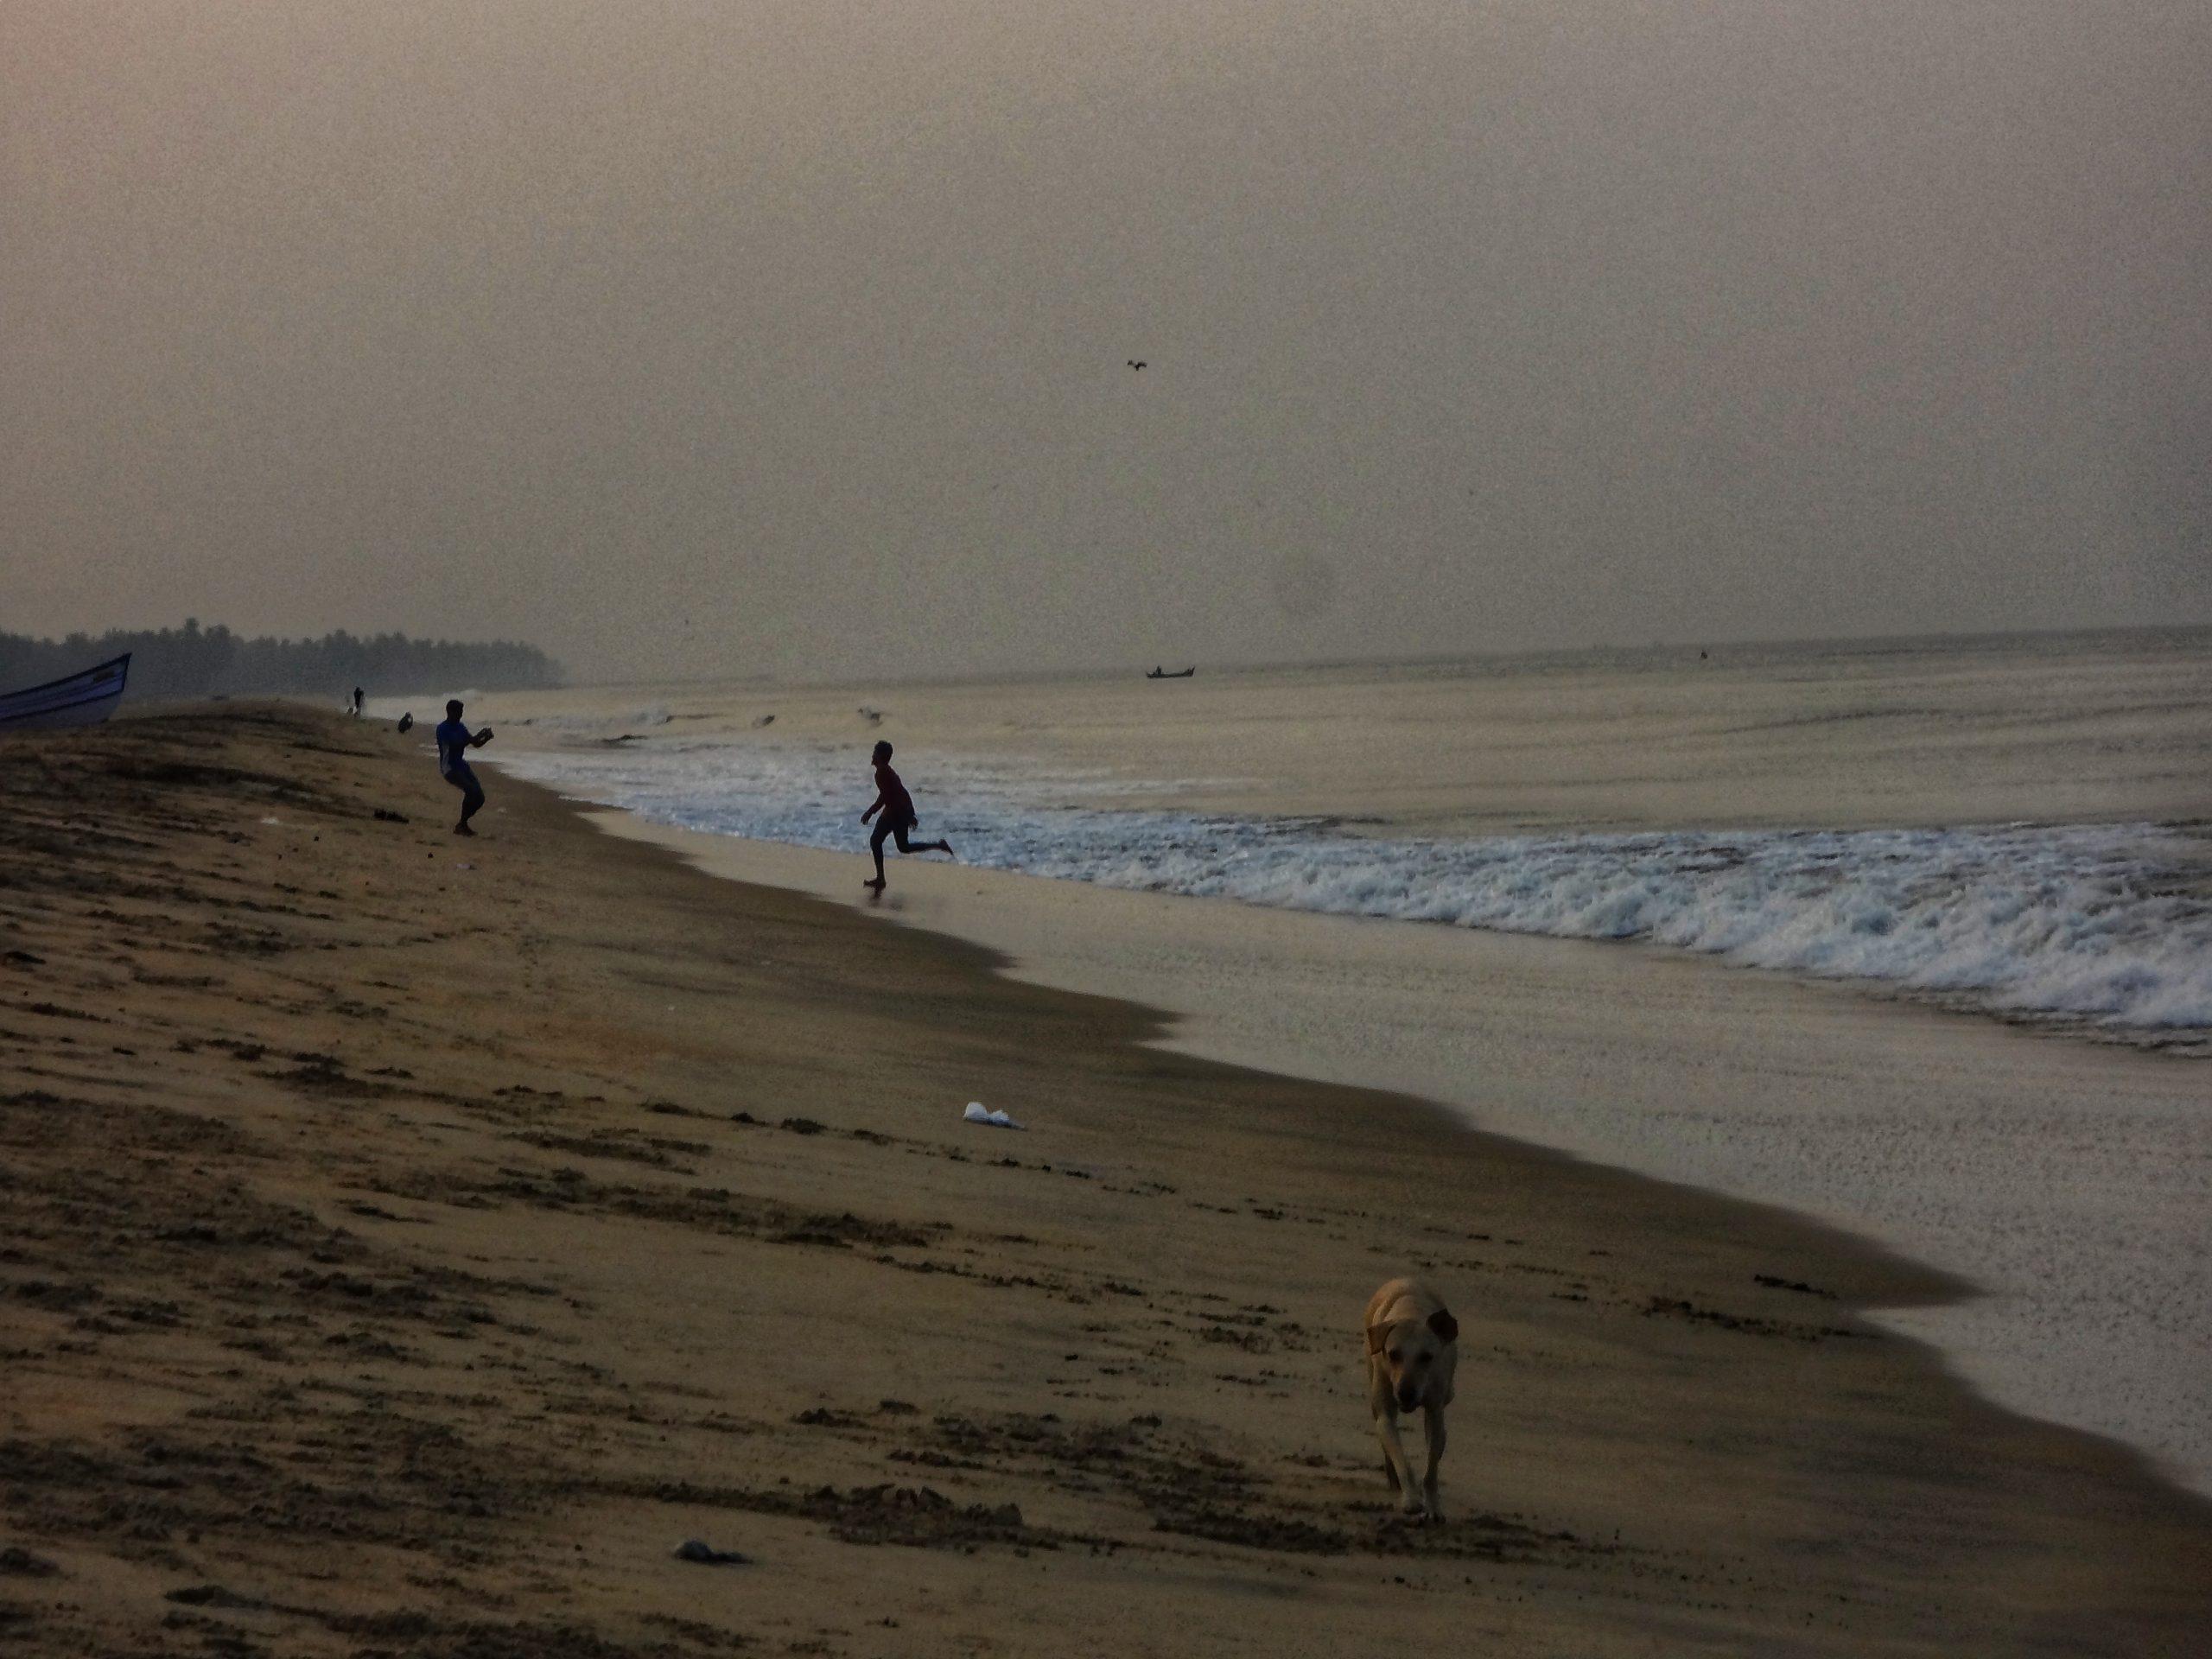 Chavakkad Beach in Kerala